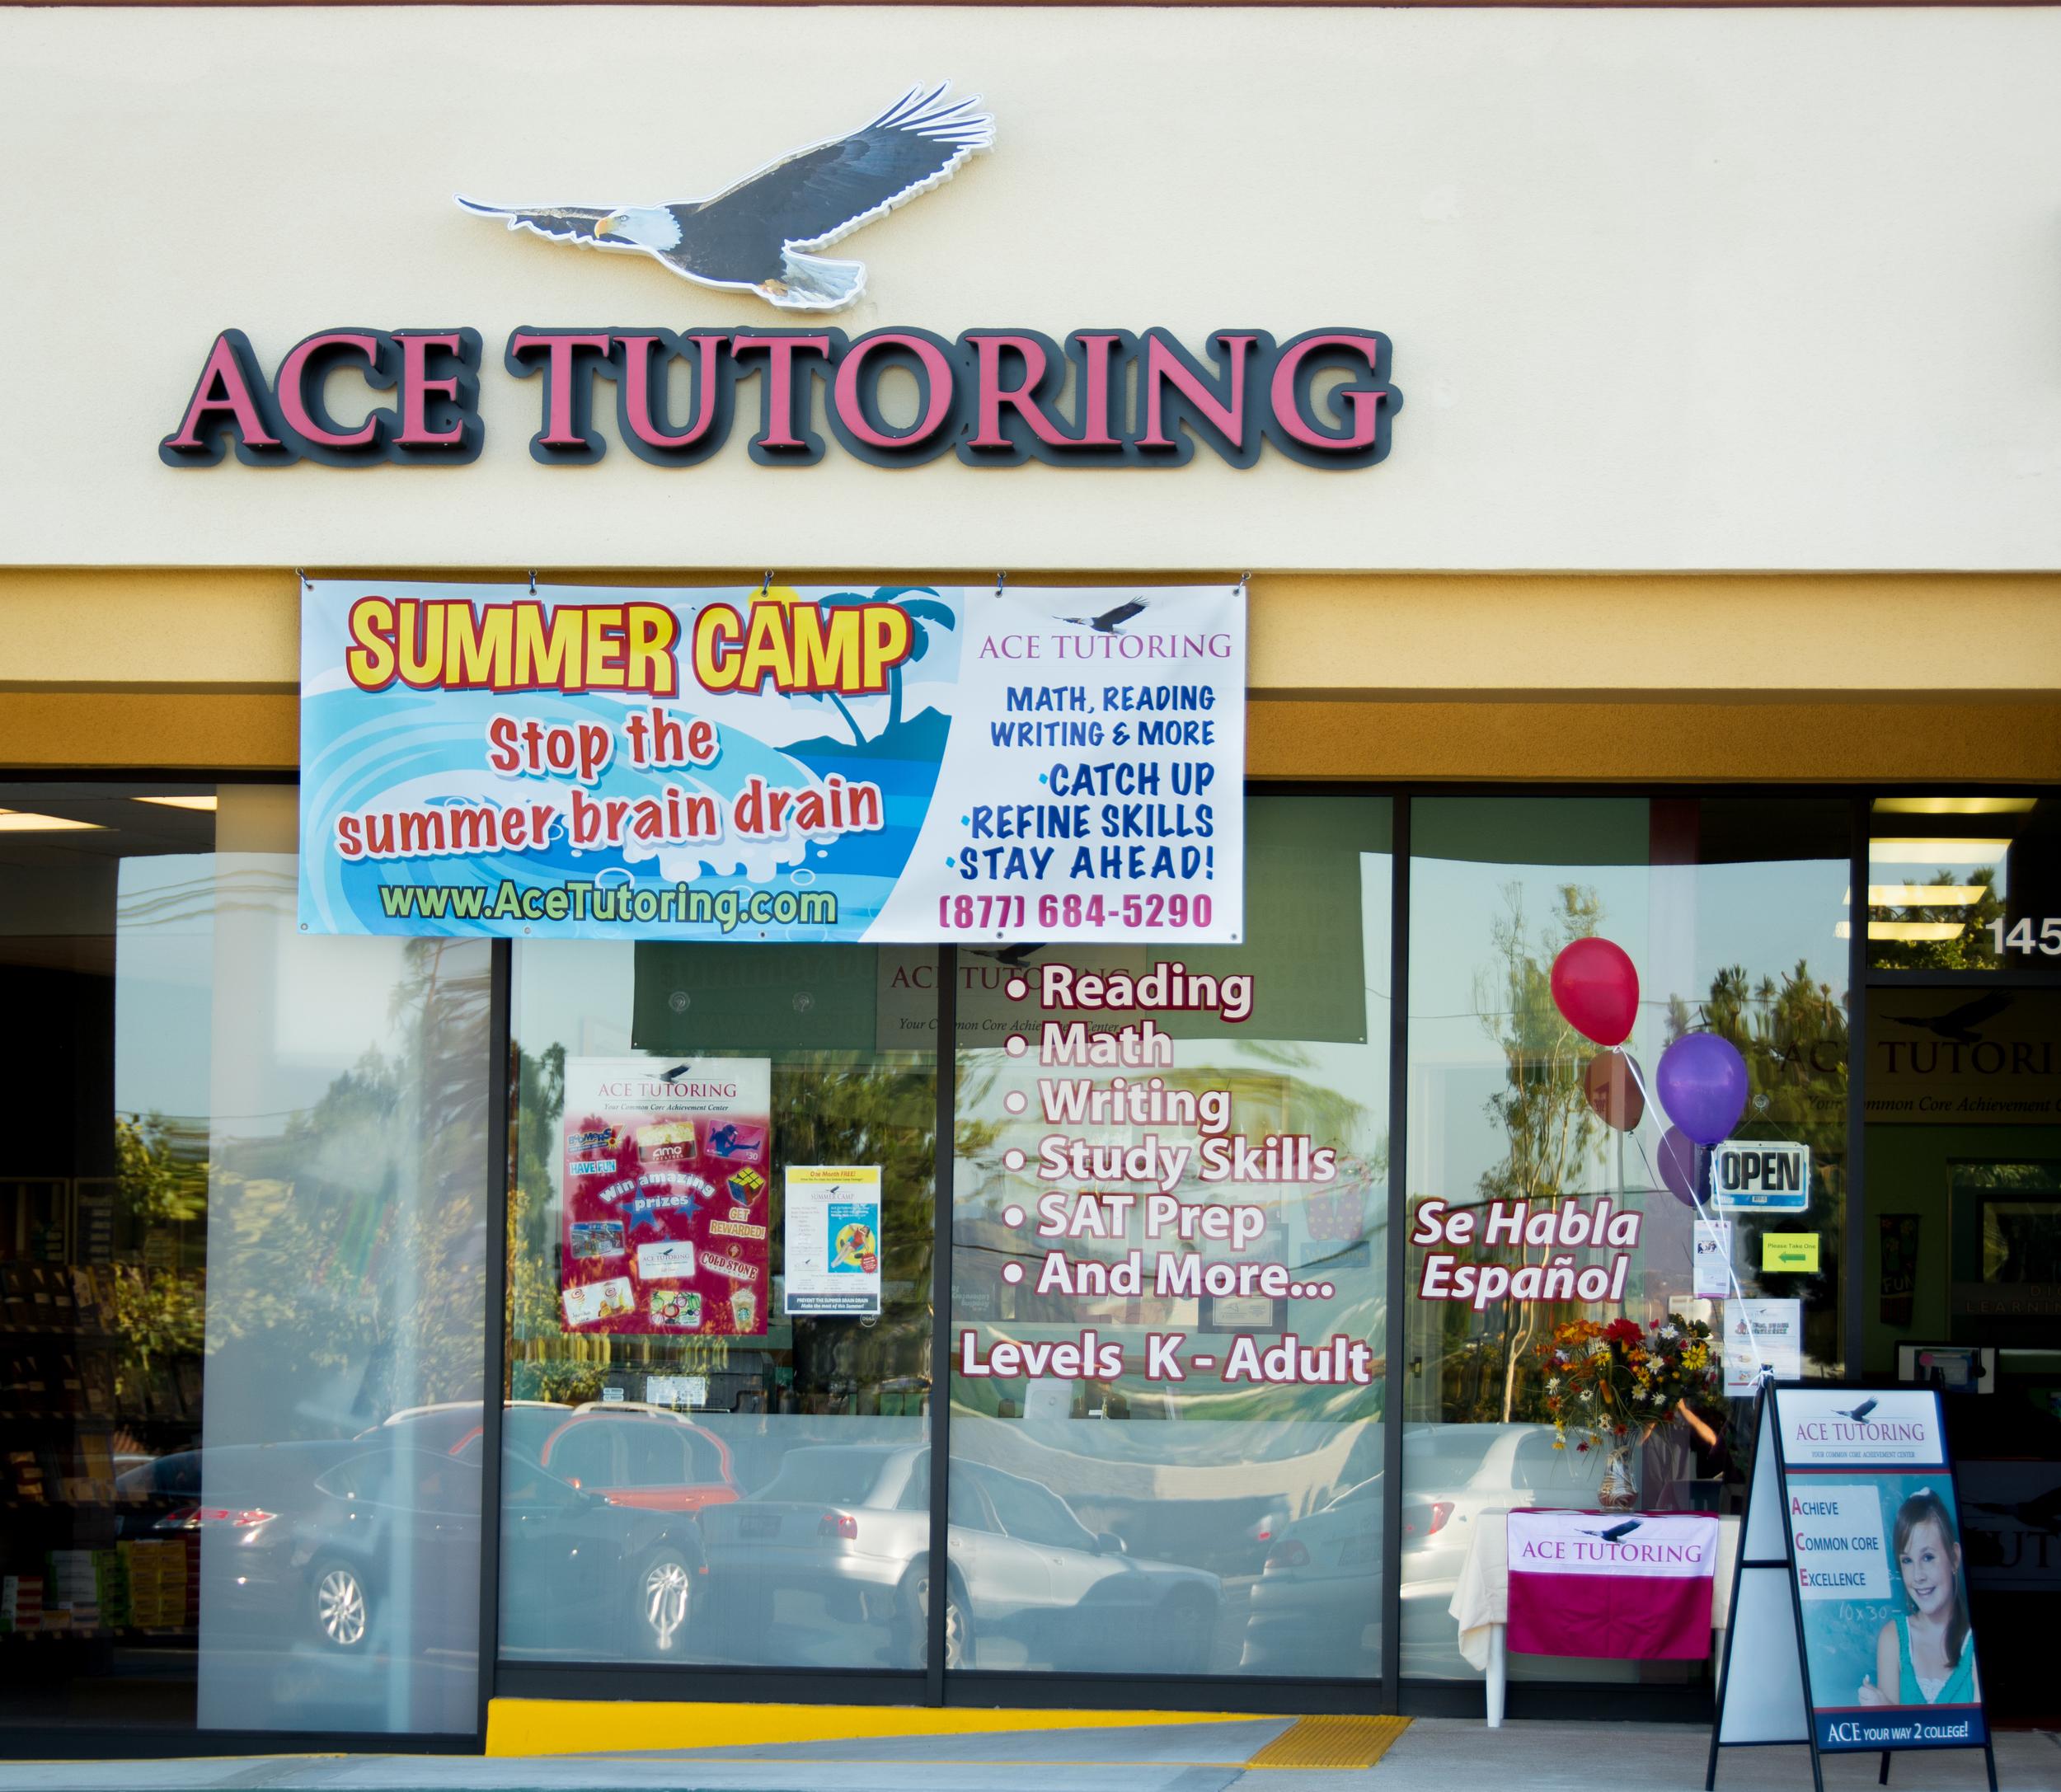 ACE Tutoring - San Marcos, CA Tutoring Center